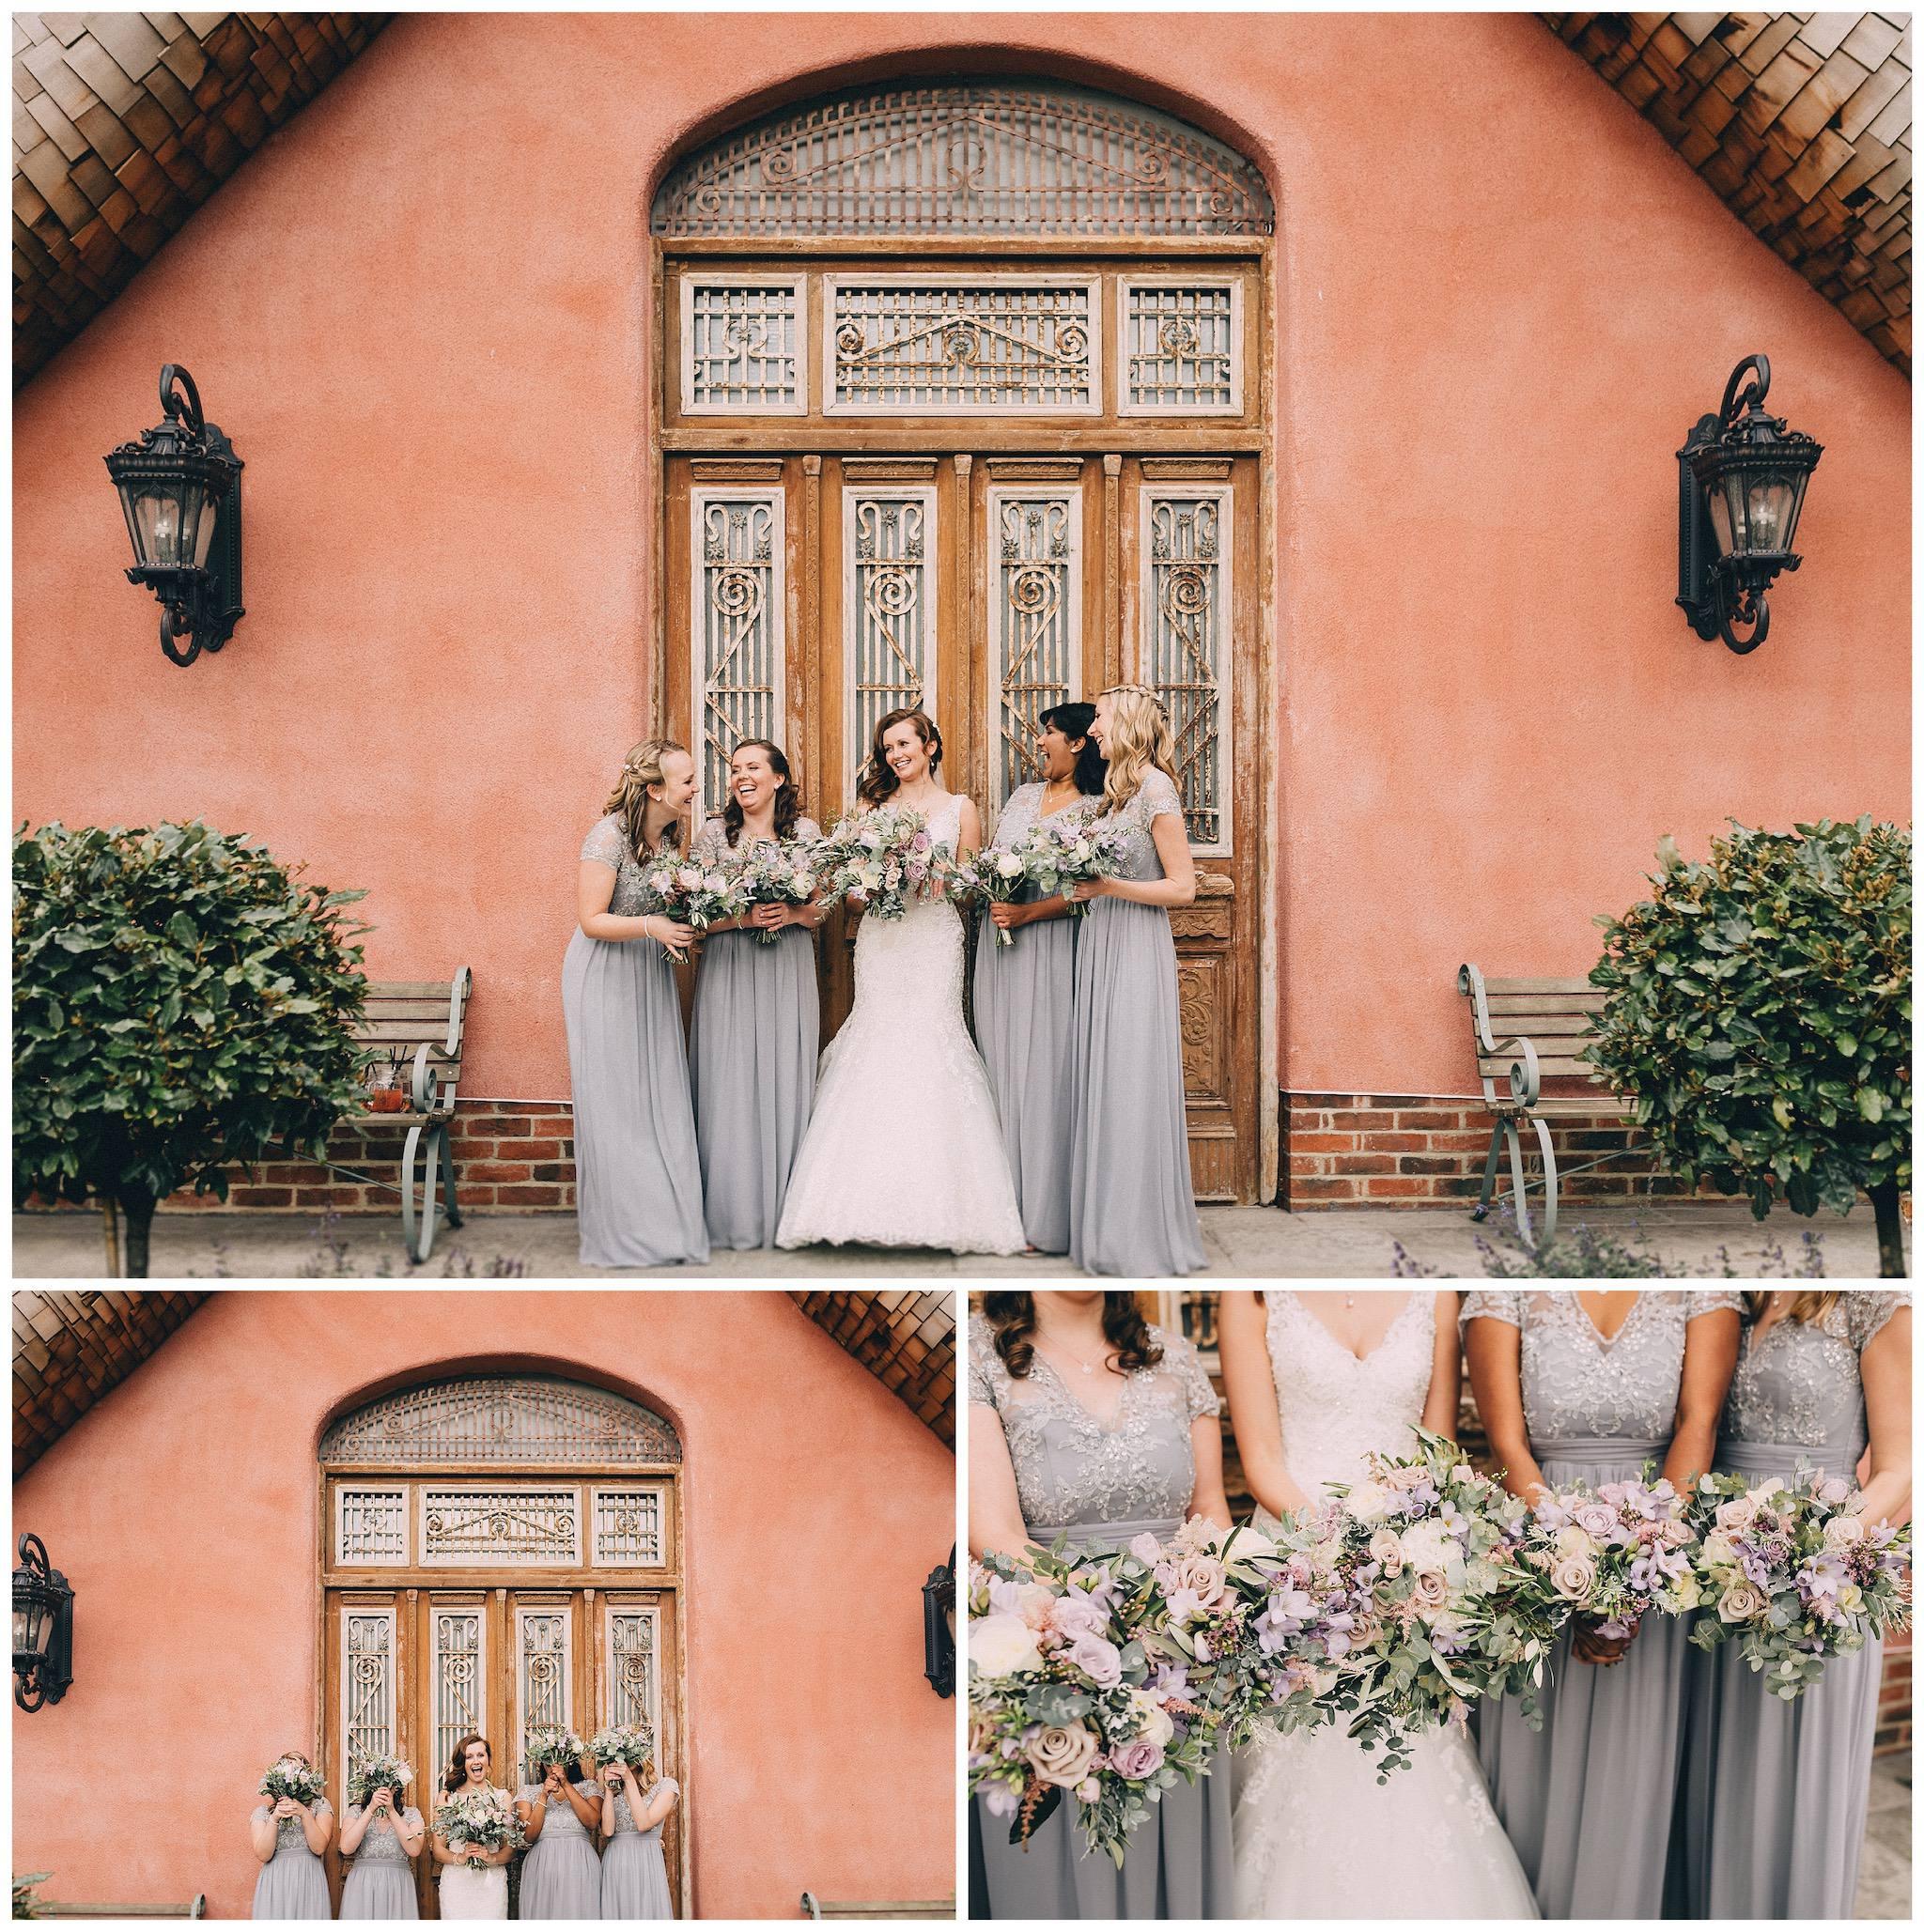 Le-Petit-Chateau-Wedding-Photographer-13.jpg